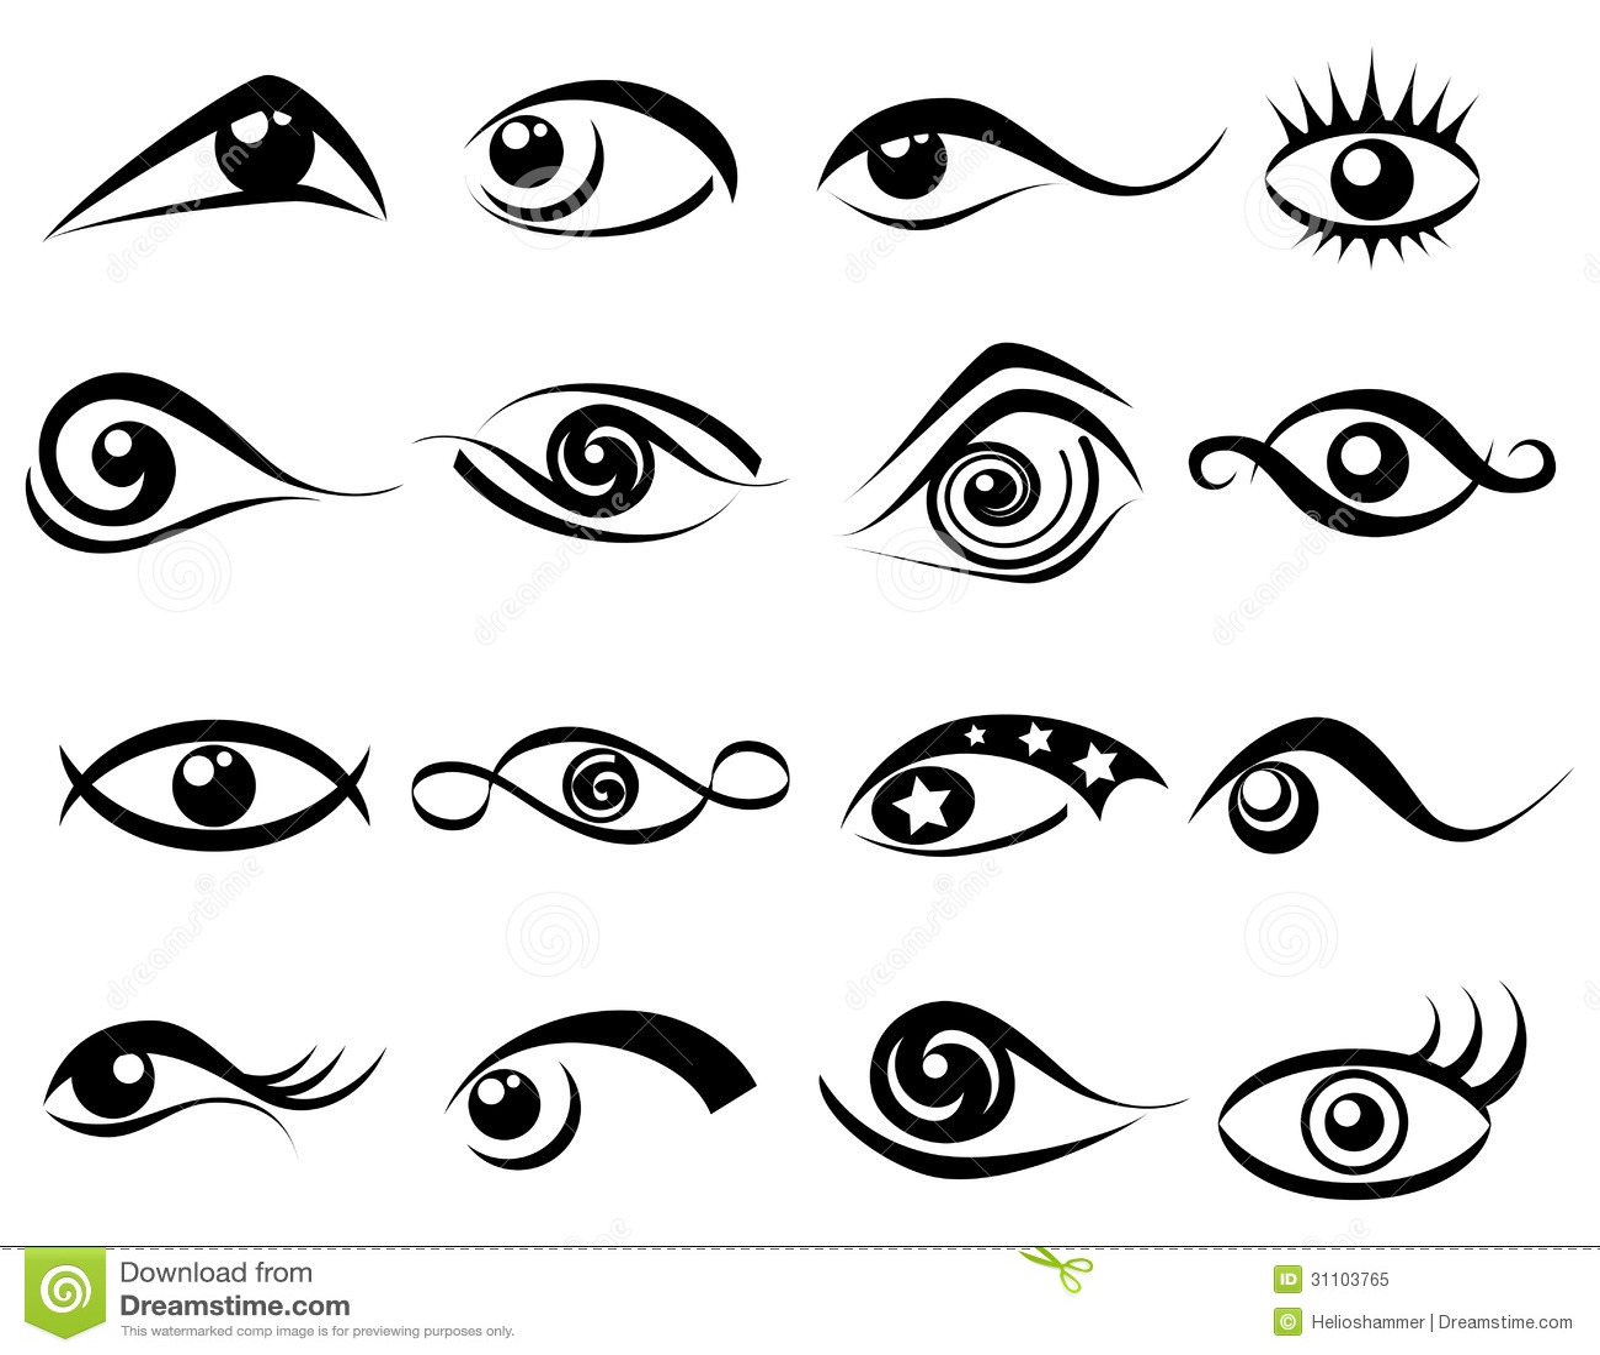 abstract eye symbol set stock vector illustration of eyeball clipart png eyeball clipart black and white